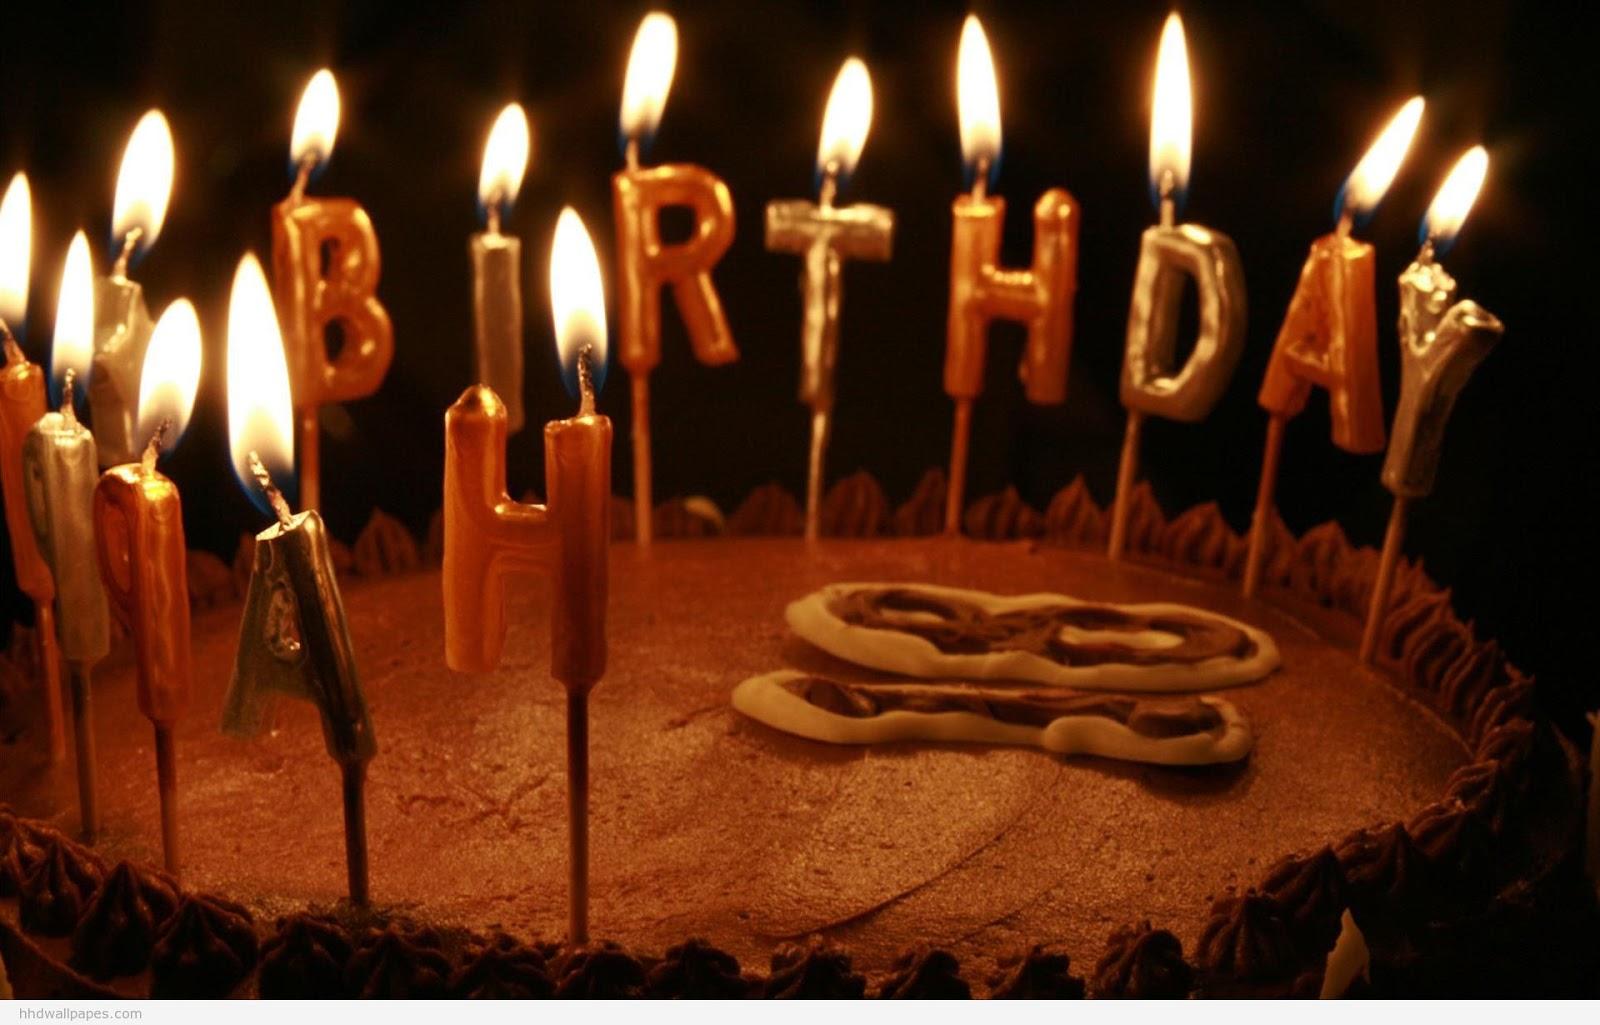 Photo collection pososibo happy birthday wishes happy birthday wishes messages quotes pictures dp status 1600x895 voltagebd Images